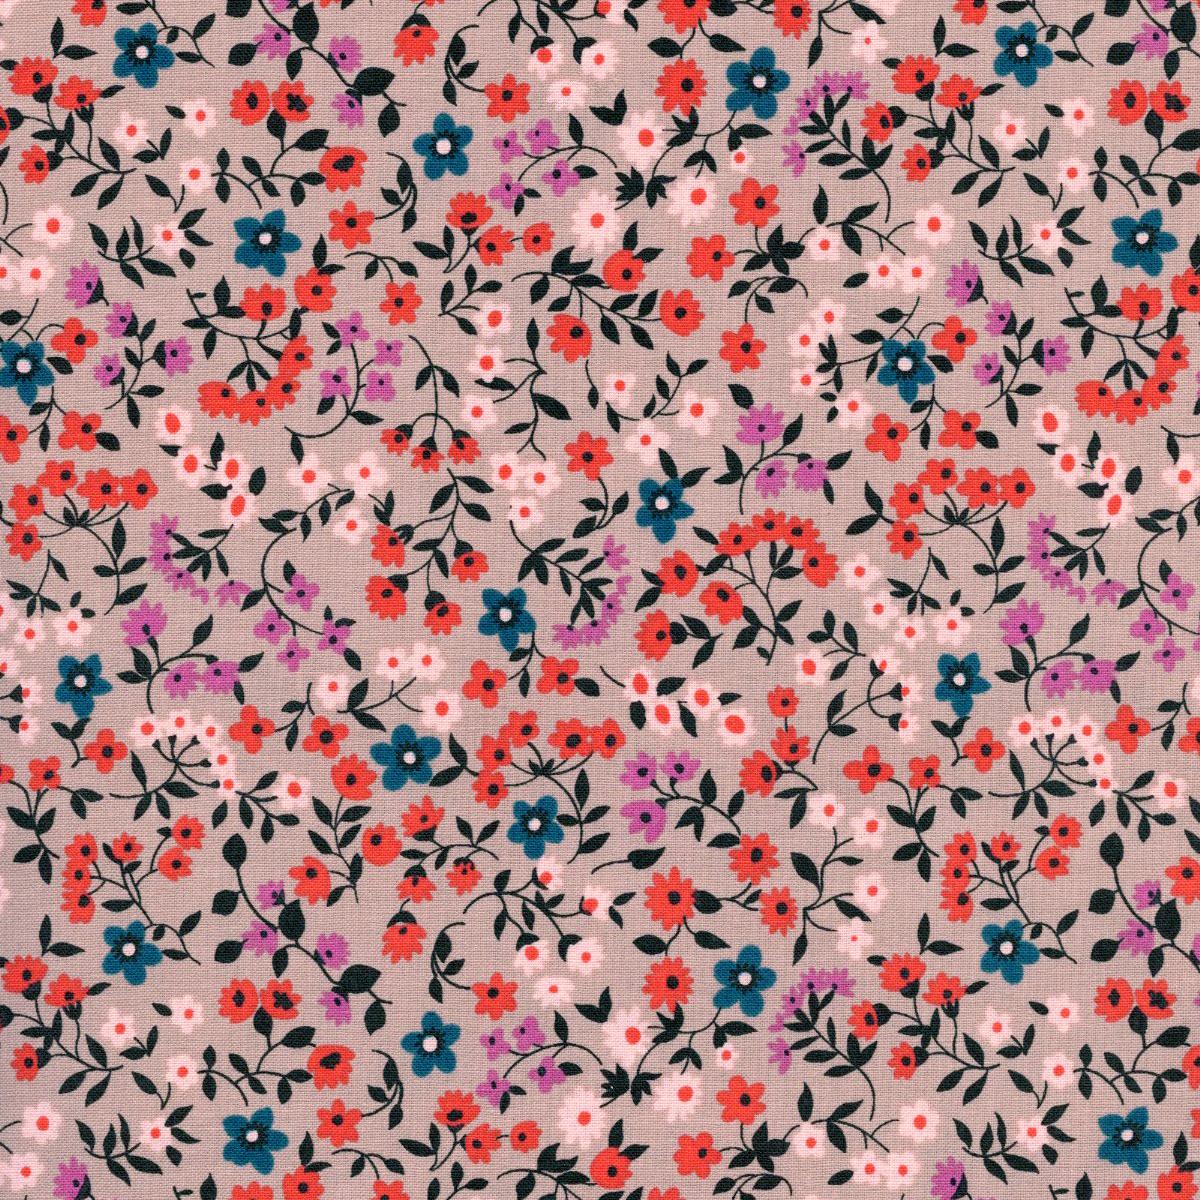 3023-2.Kim.Lucky.Strikes.Clothesline.Floral.Red